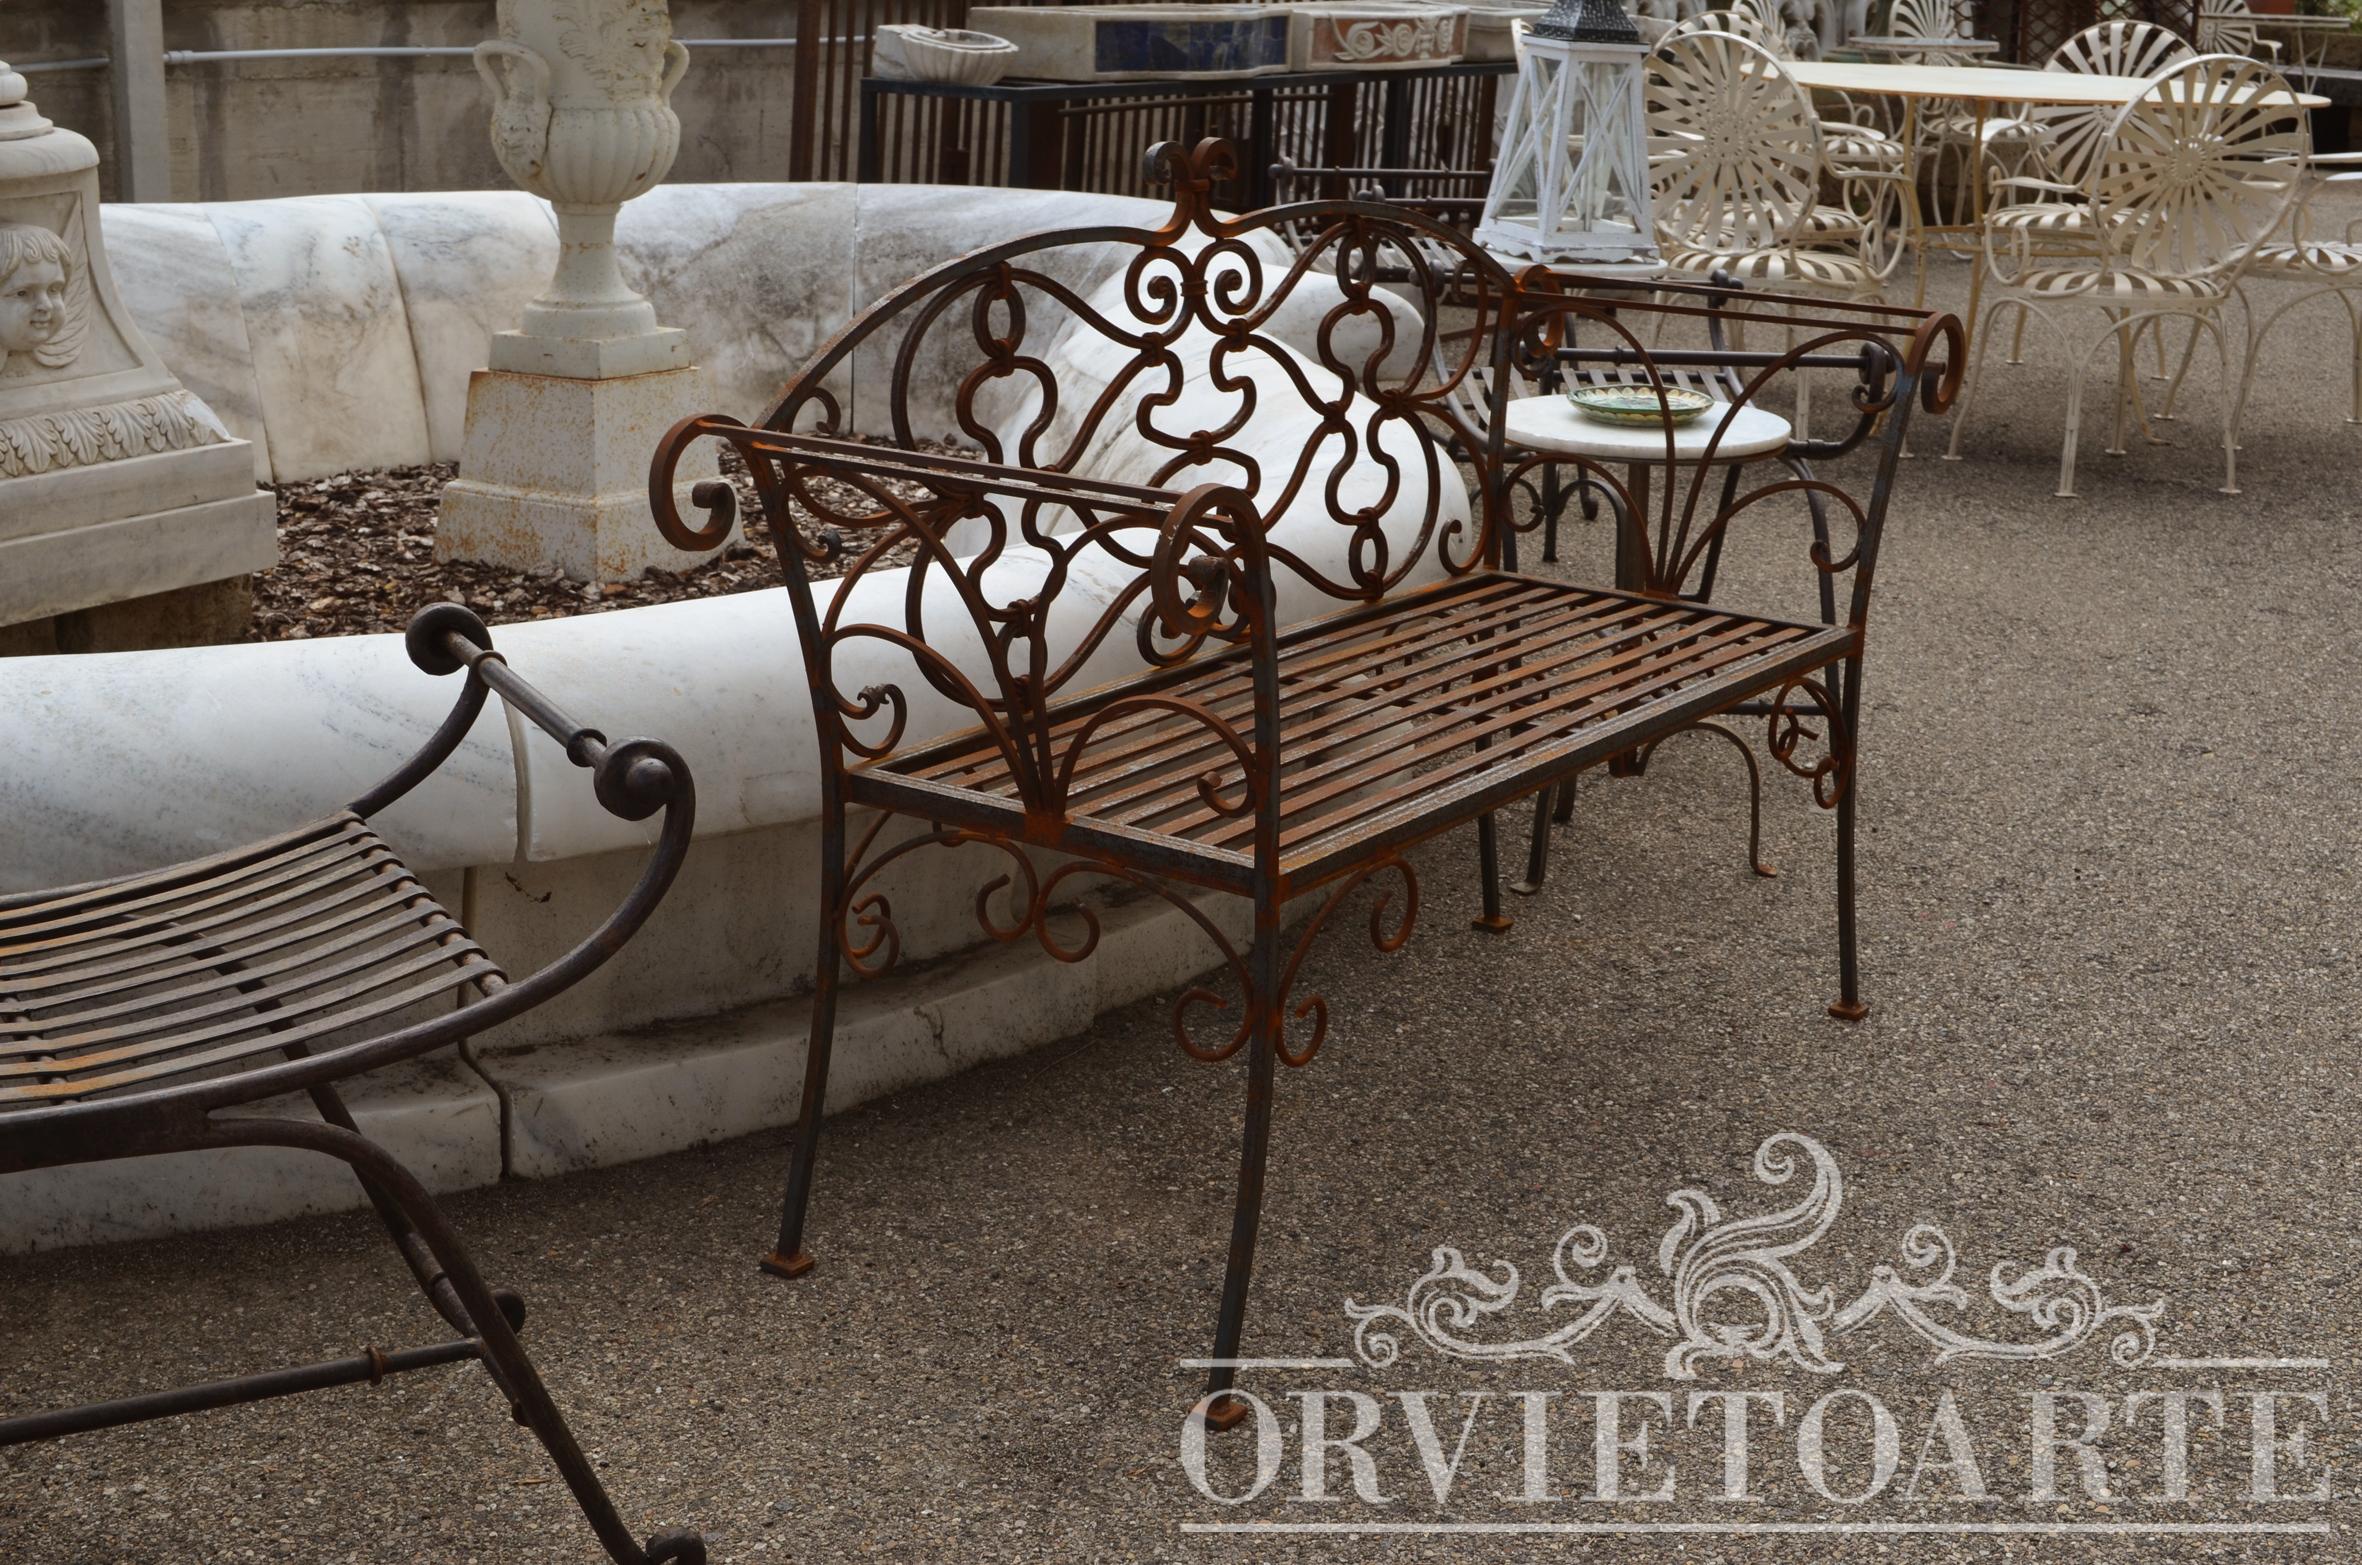 Orvieto arte panchina in ferro battuto for Arredo giardino ferro battuto